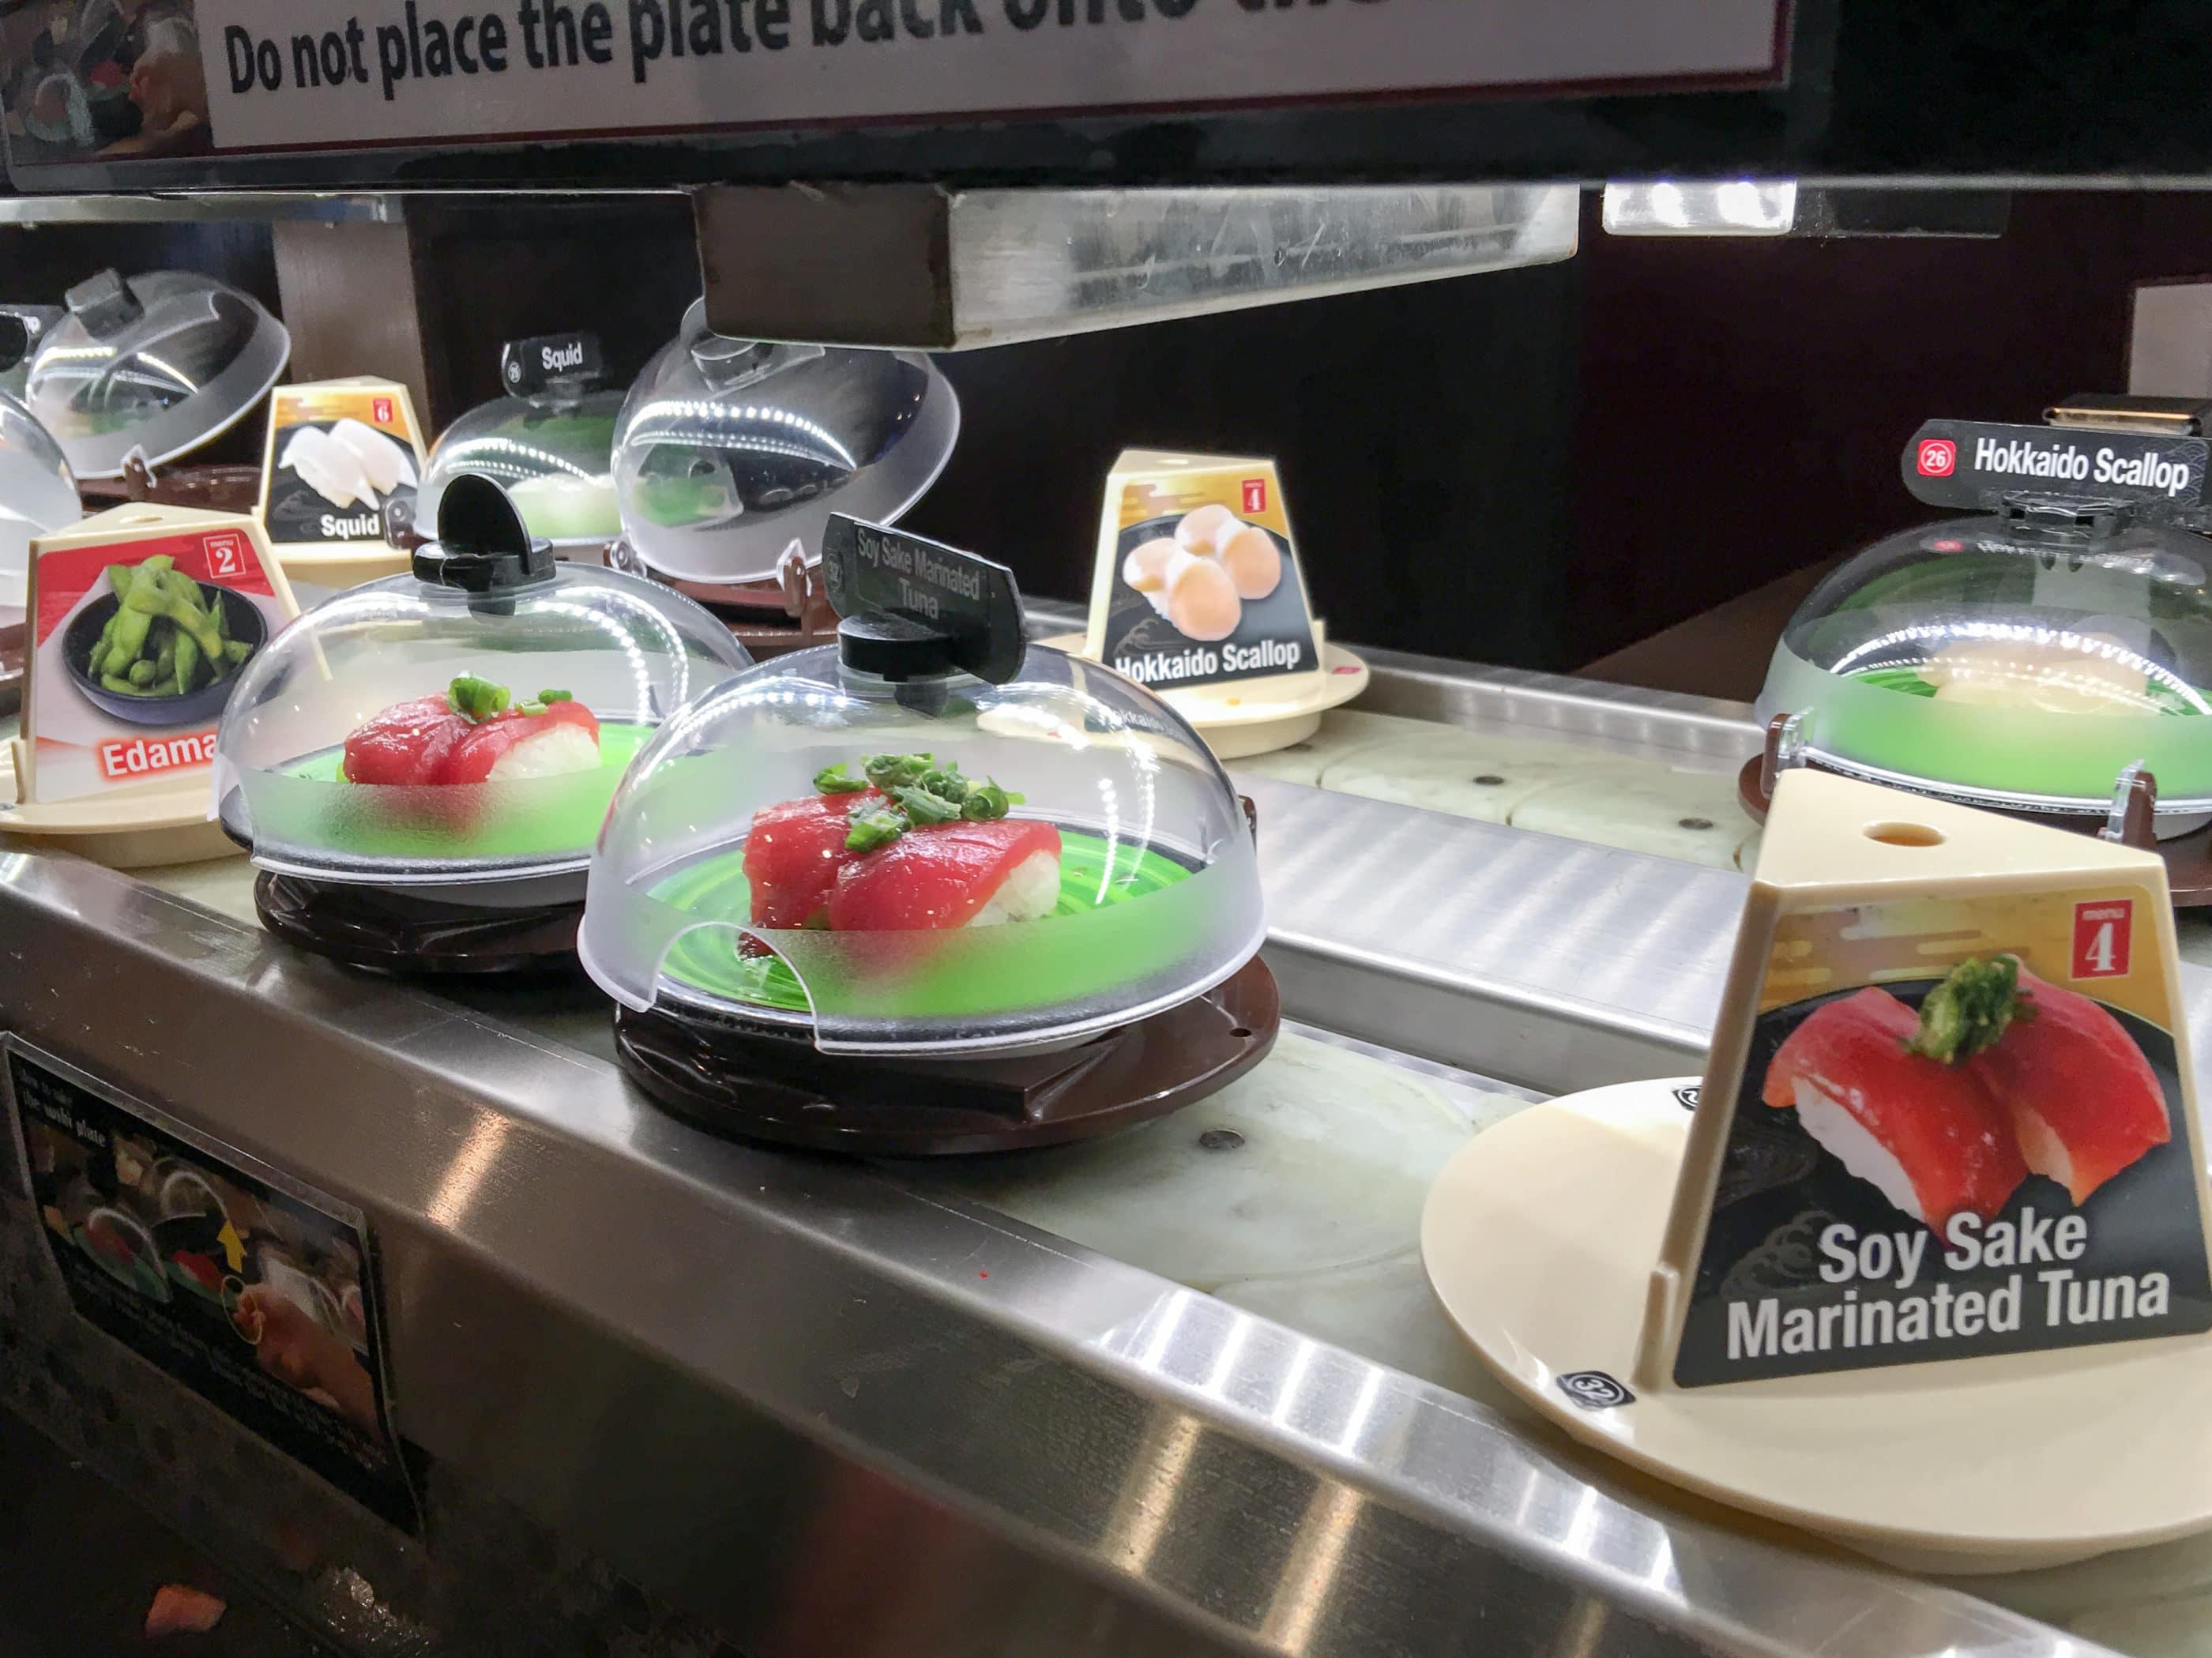 Tuna nigiri sushi under domes travels across a conveyor belt at Kura Sushi in San Diego.